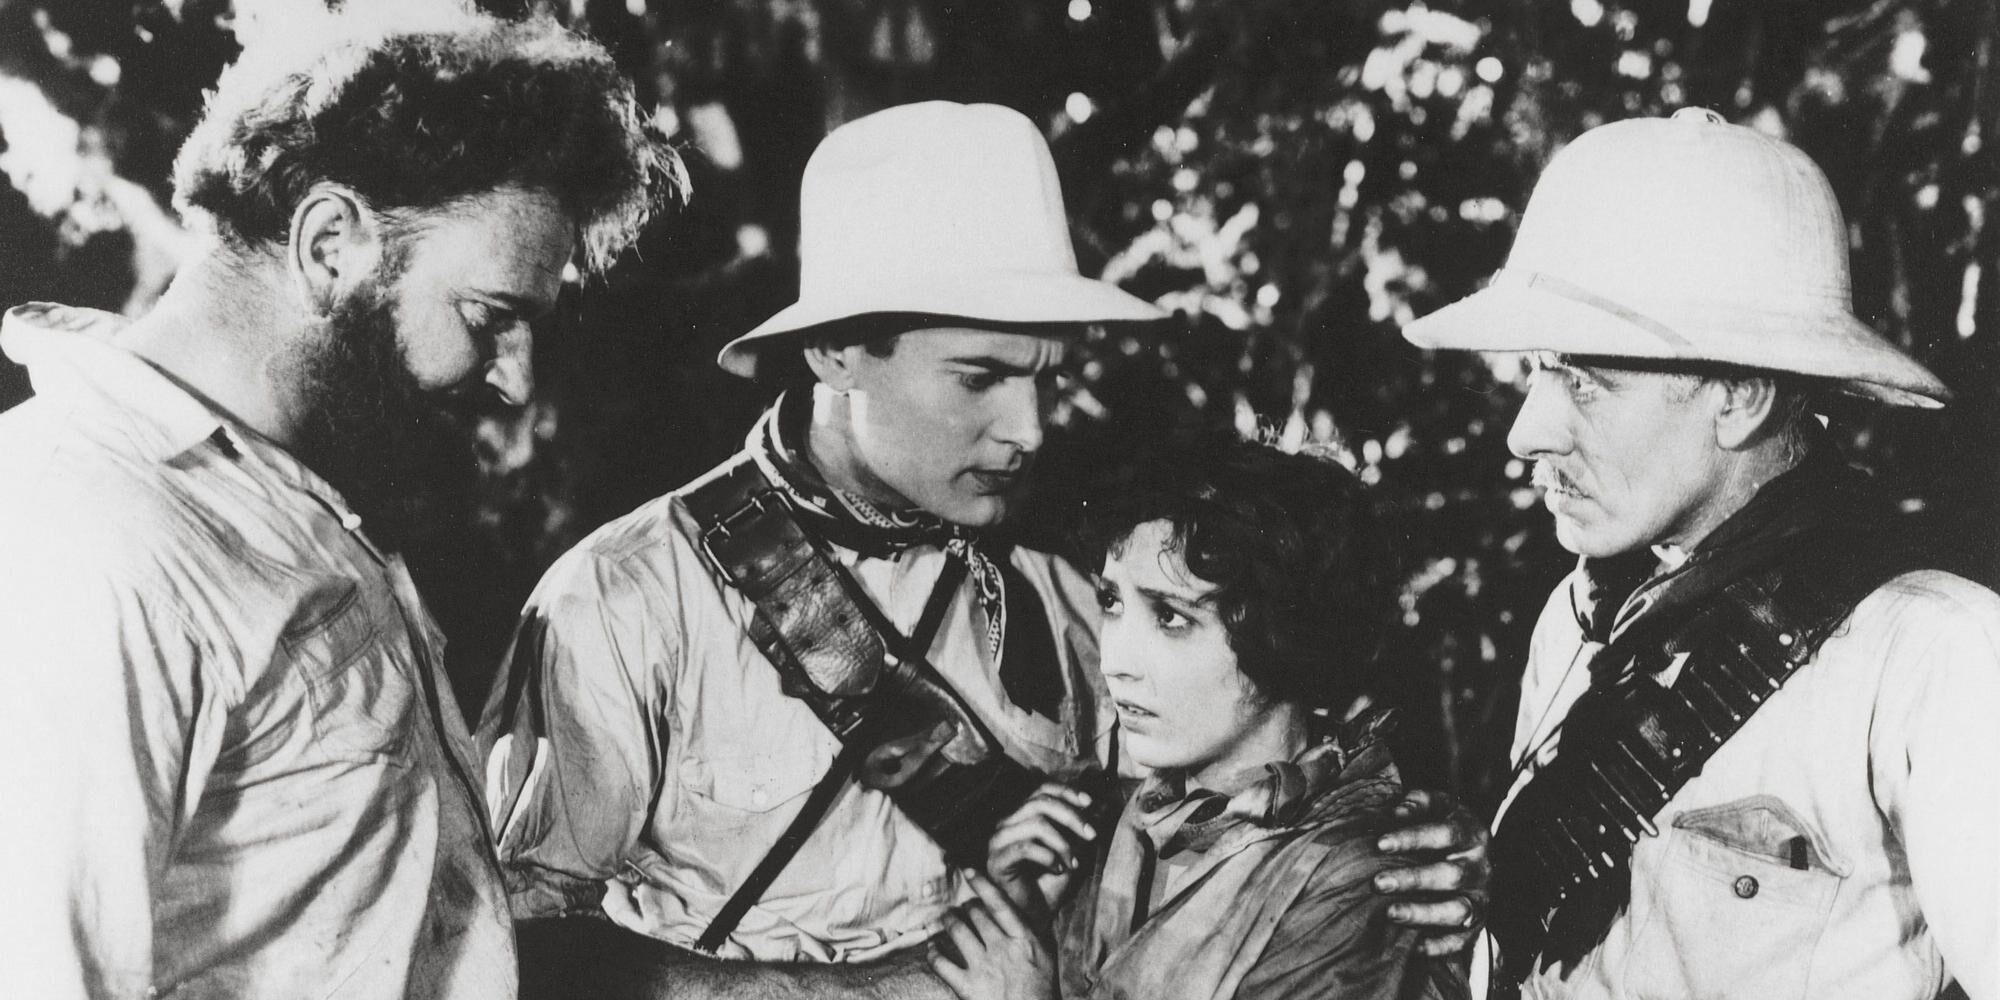 P05088 Original Film Title: THE LOST WORLD.  English Title: THE LOST WORLD.  Film Director: HARRY HOYT.  Year: 1925.  Stars: LEWIS STONE; BESSIE LOVE. Credit: FIRST NATIONAL / Album